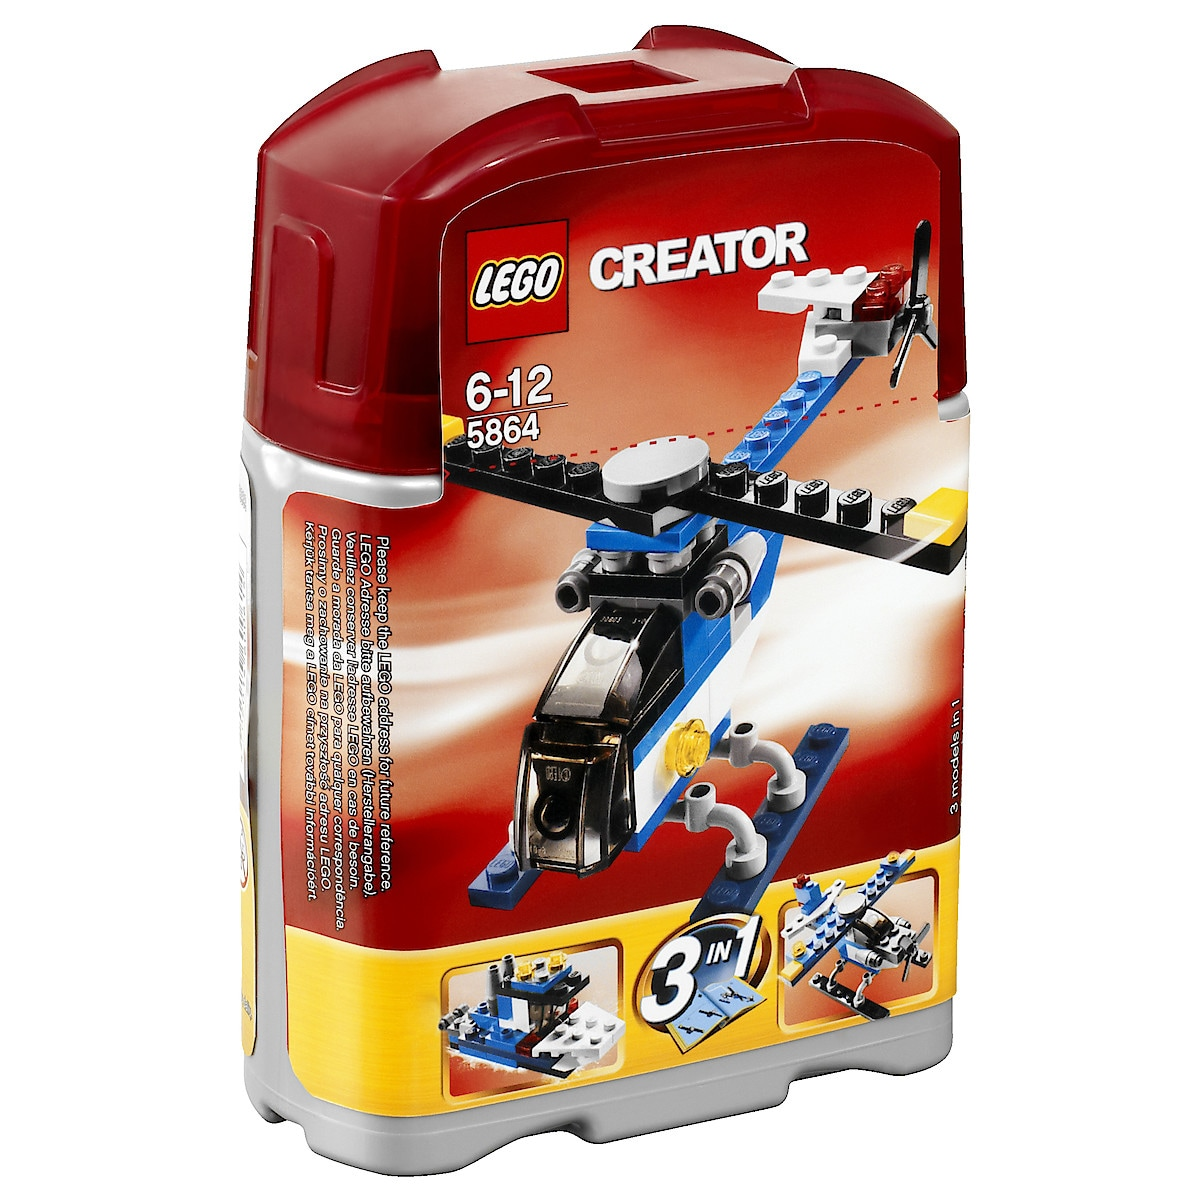 Lego tre-i-en minihelikopter